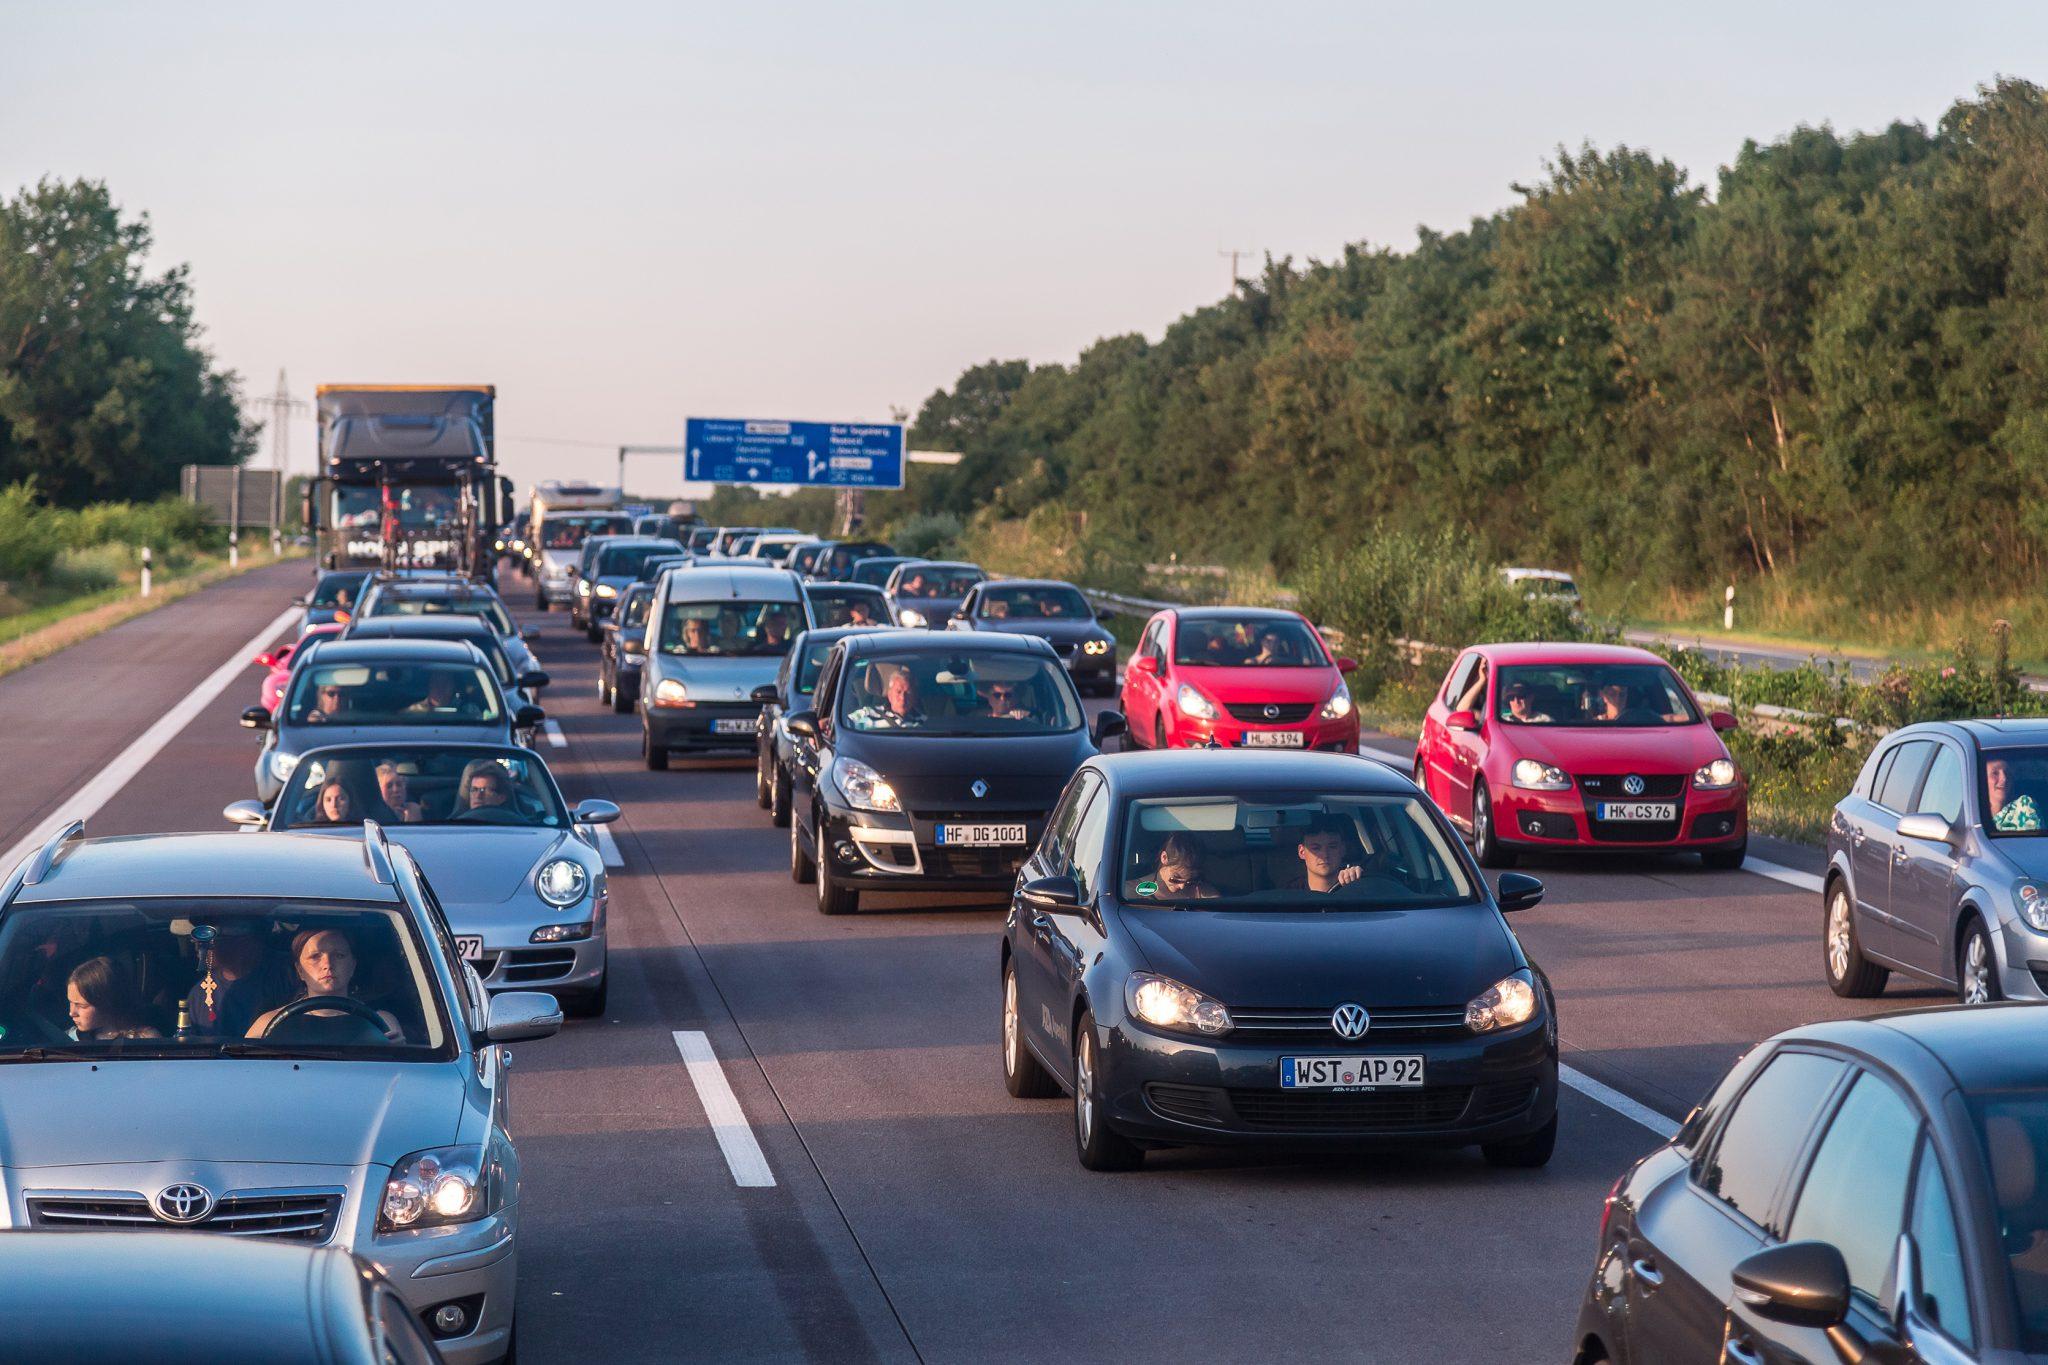 Vejdirektoratet: Forvent tæt trafik